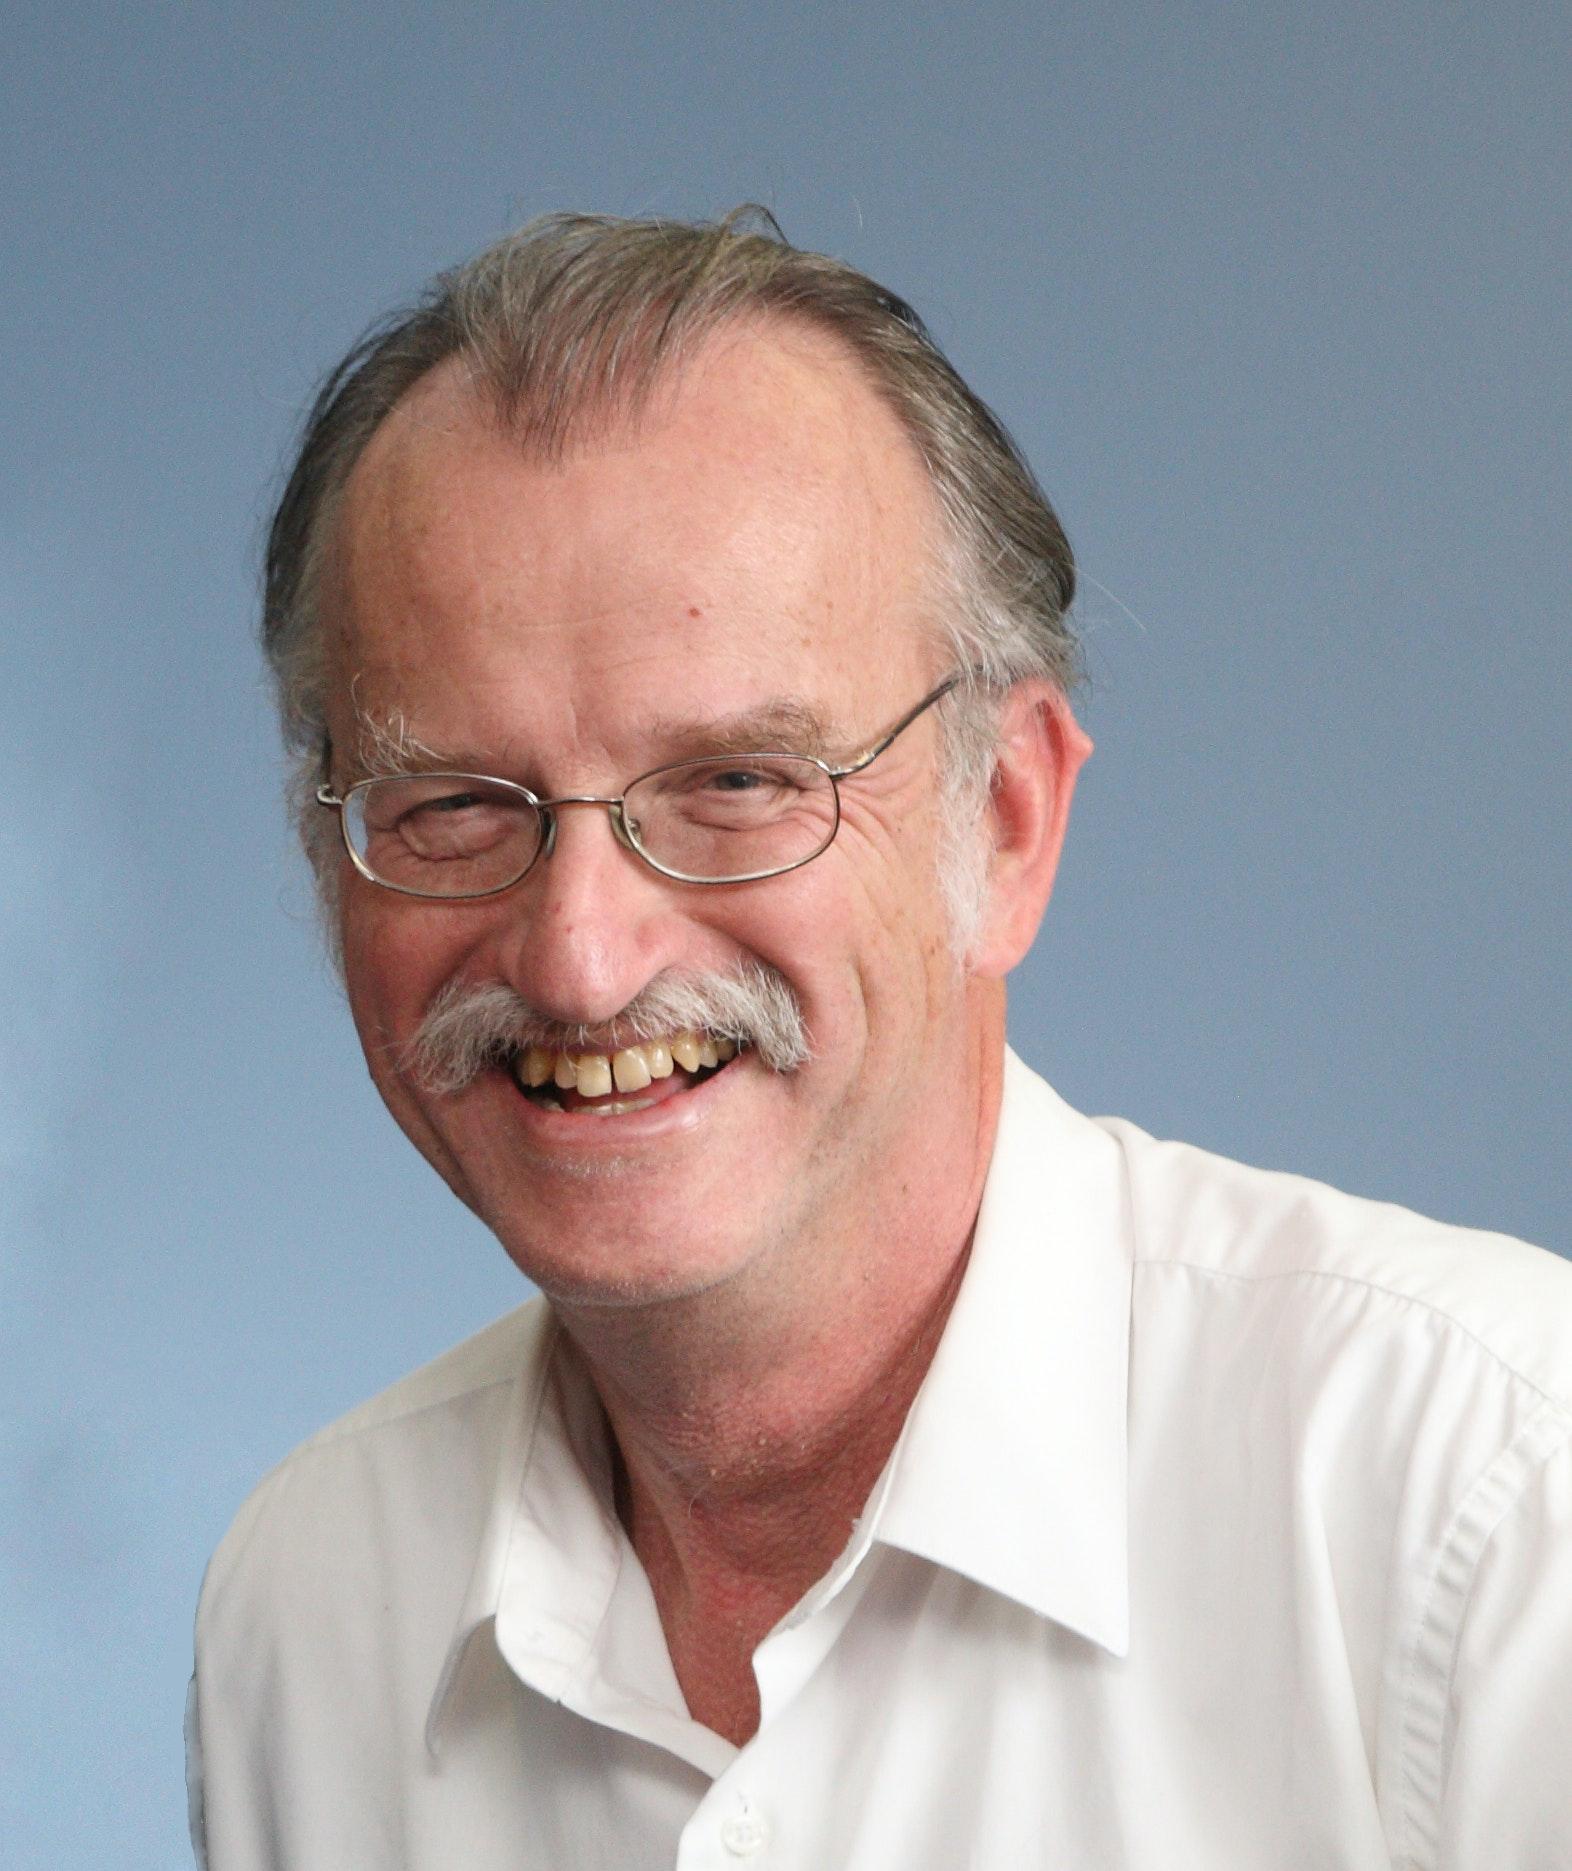 Peter Onuf